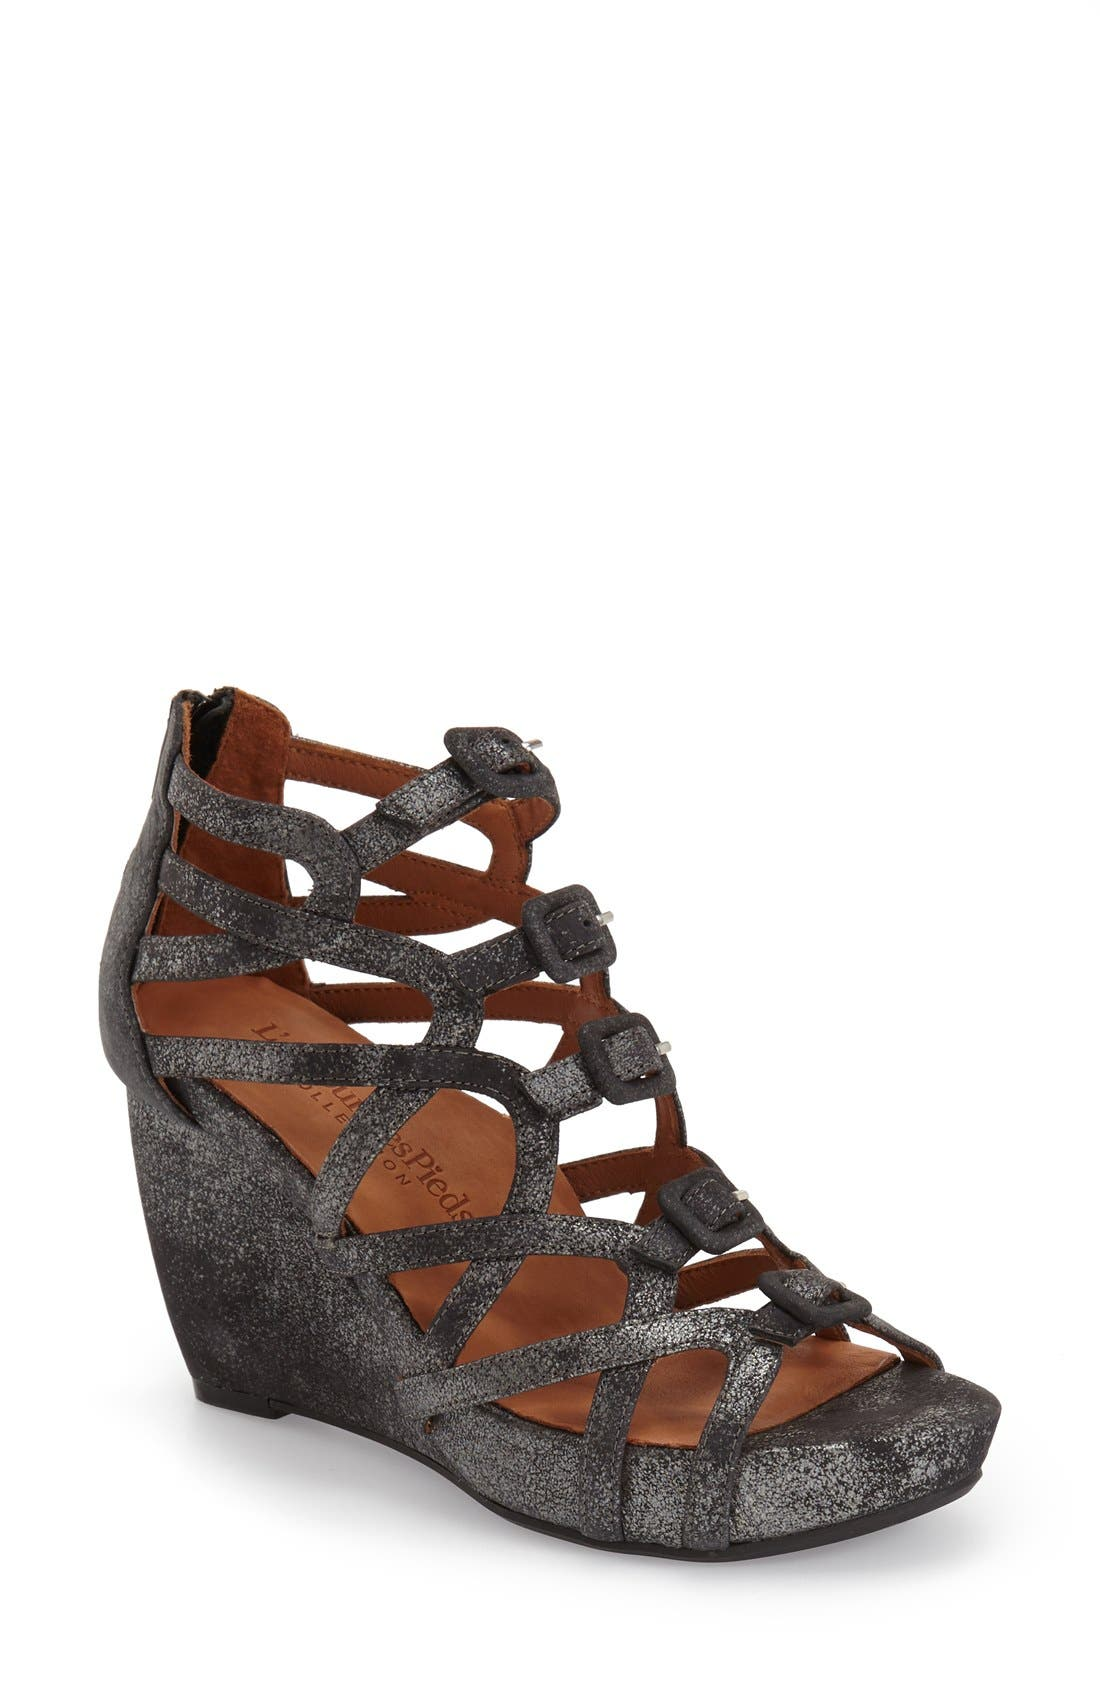 L'Amour des Pieds'Ivanna' Gladiator Wedge Sandal (Women)